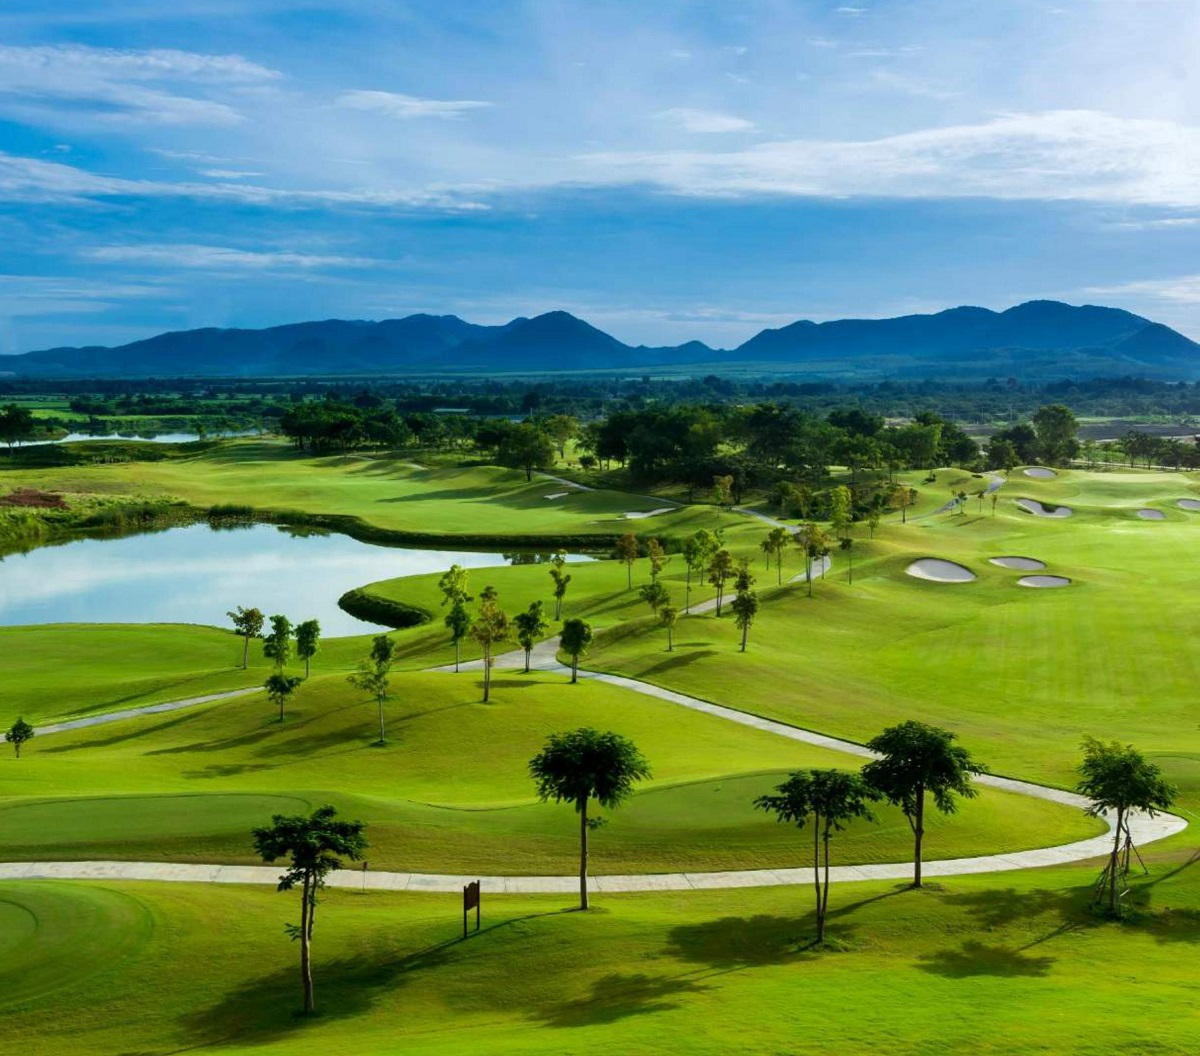 san-golf-dao-phuong-hoang-aqua-city